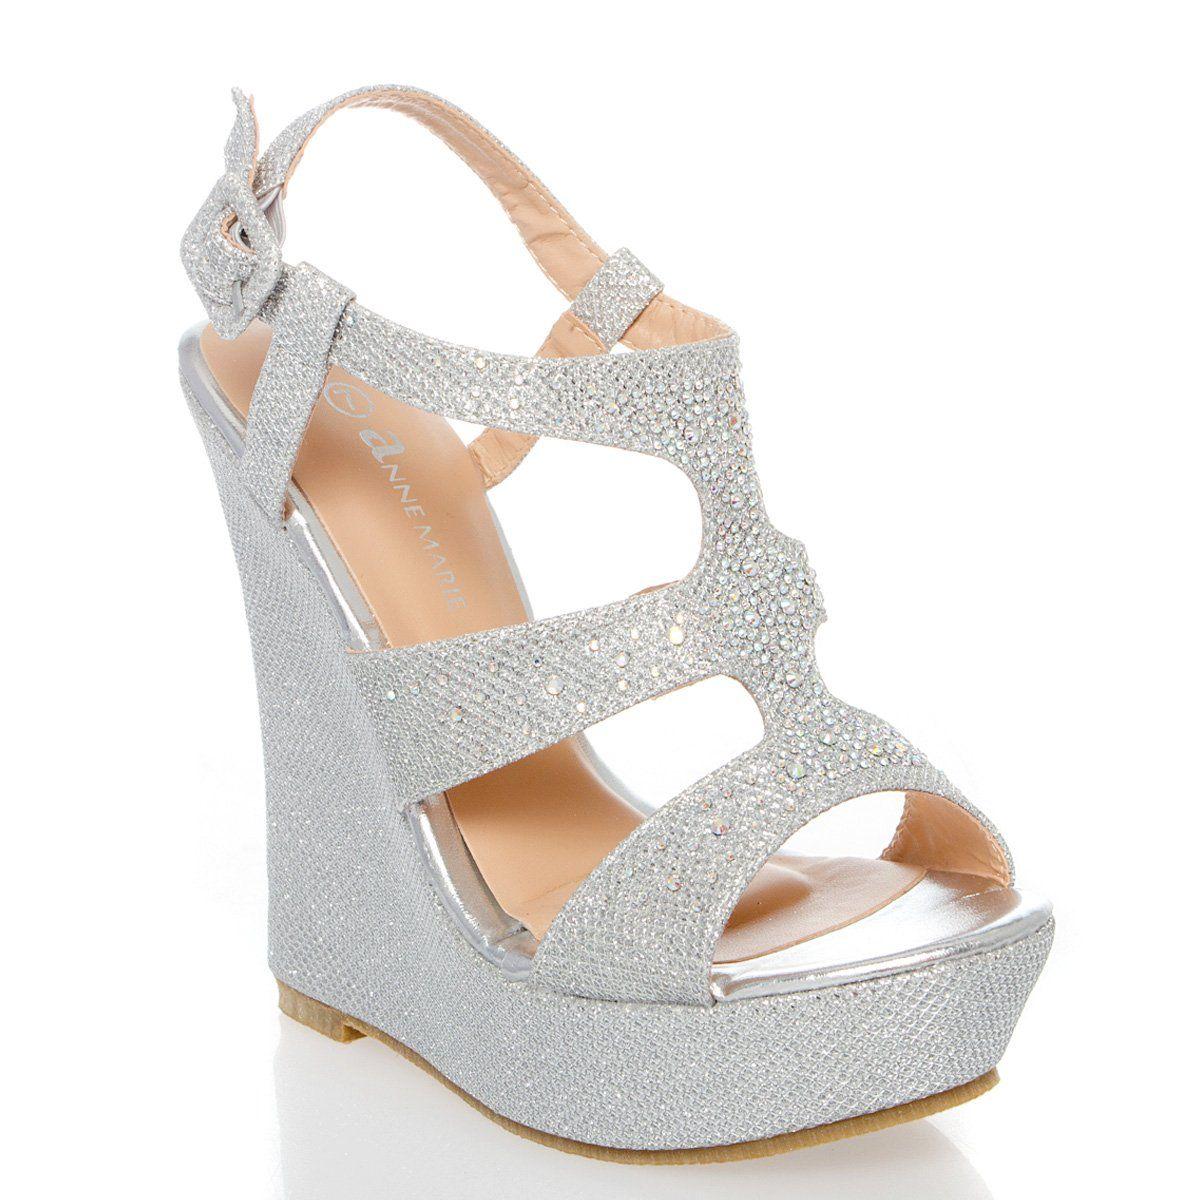 5033586d8cc65 Amazon.com: V-Luxury Womens 40-KENDRA1 Open Toe High Heel Wedge ...